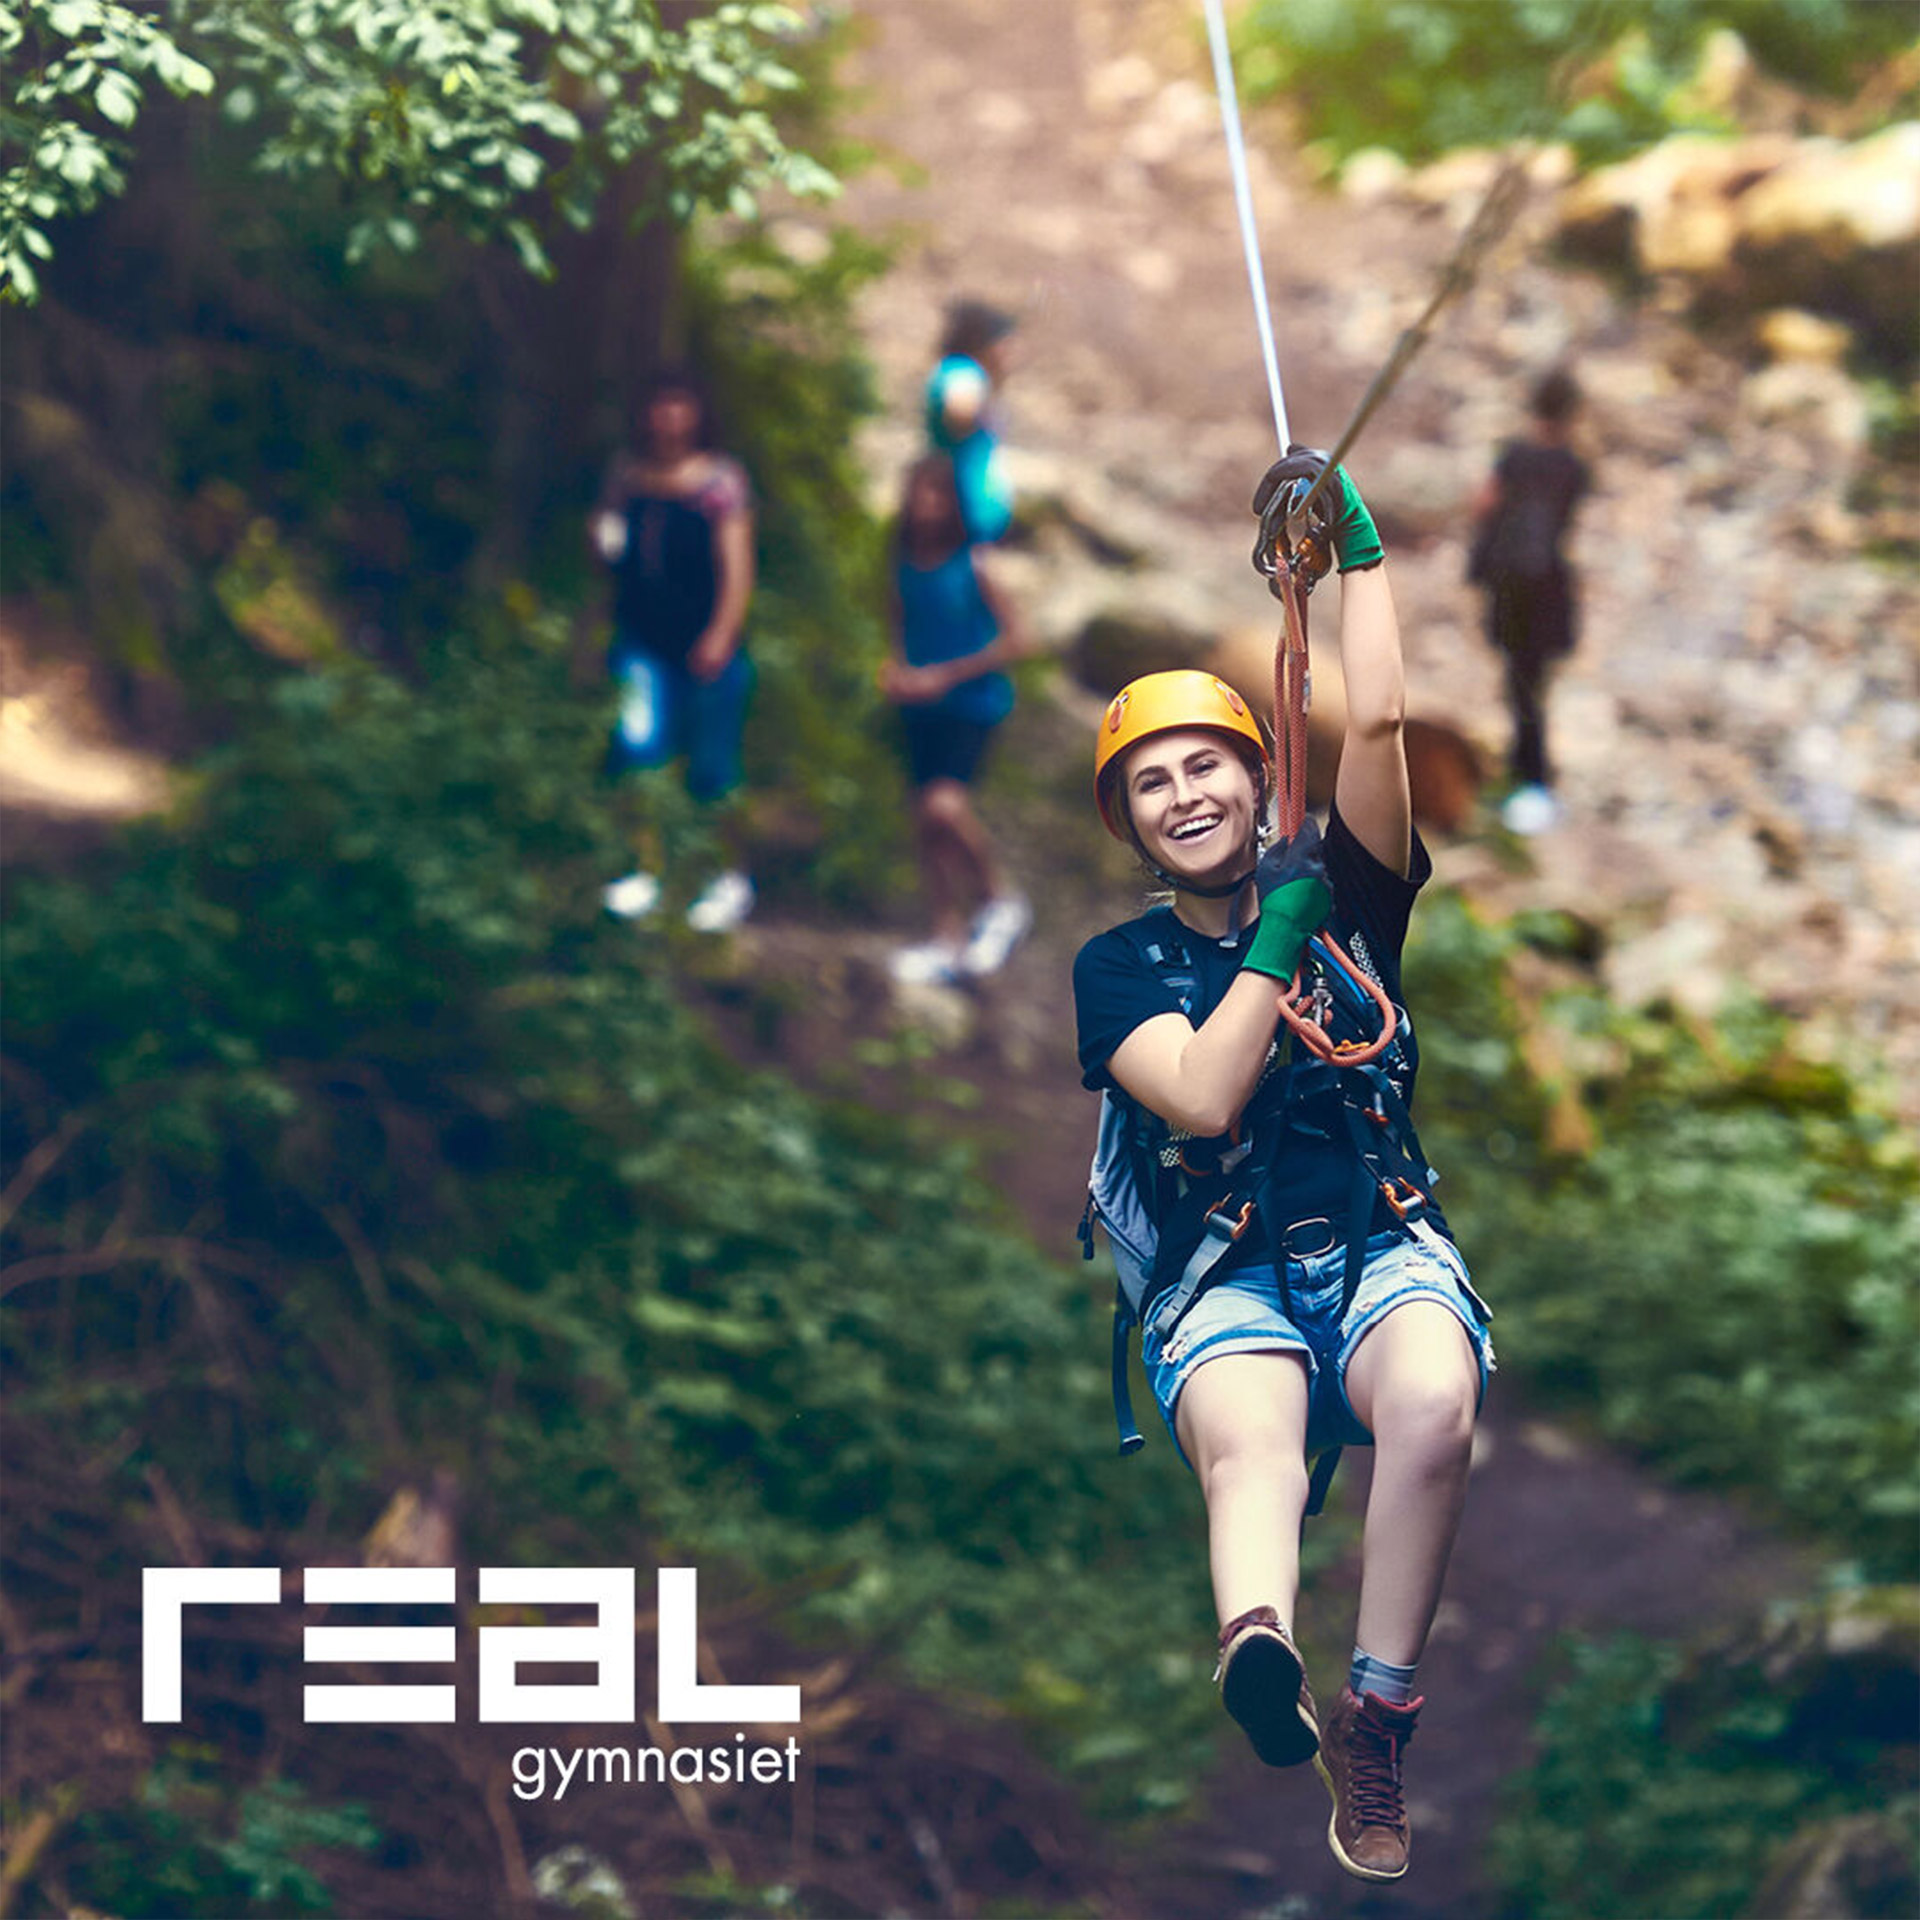 REAL-gymnasiet – Naturbruksprogrammet